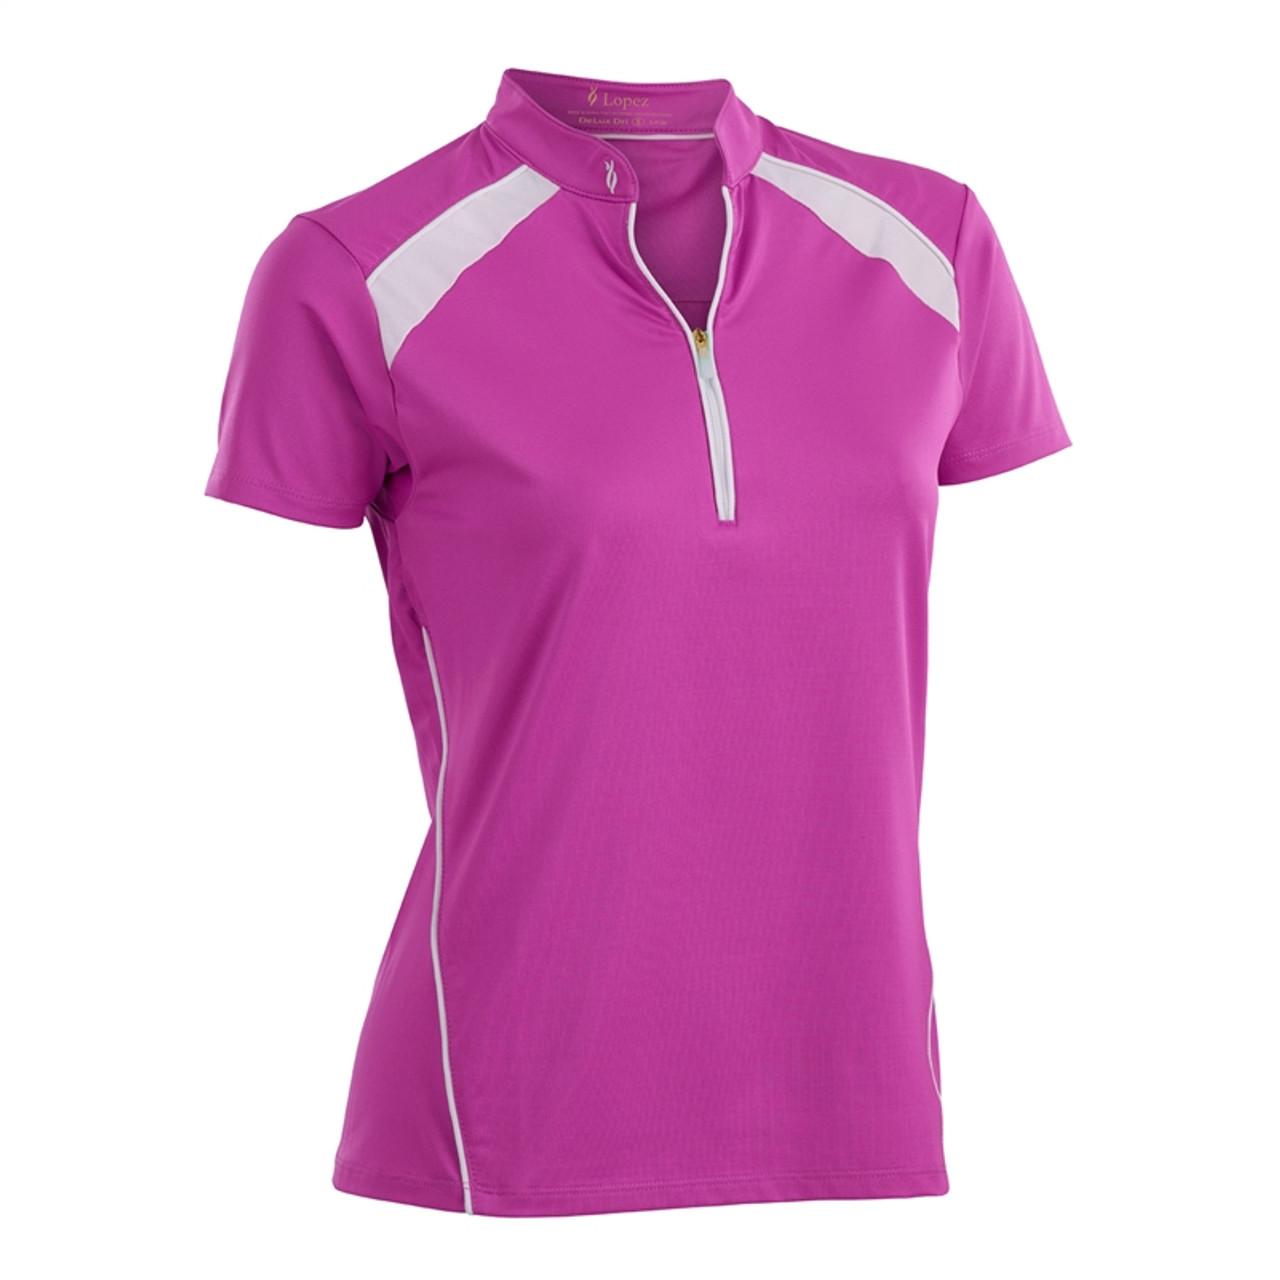 88e83d6bda6 Nancy Lopez Sporty Hot Pink Short Sleeve Polo